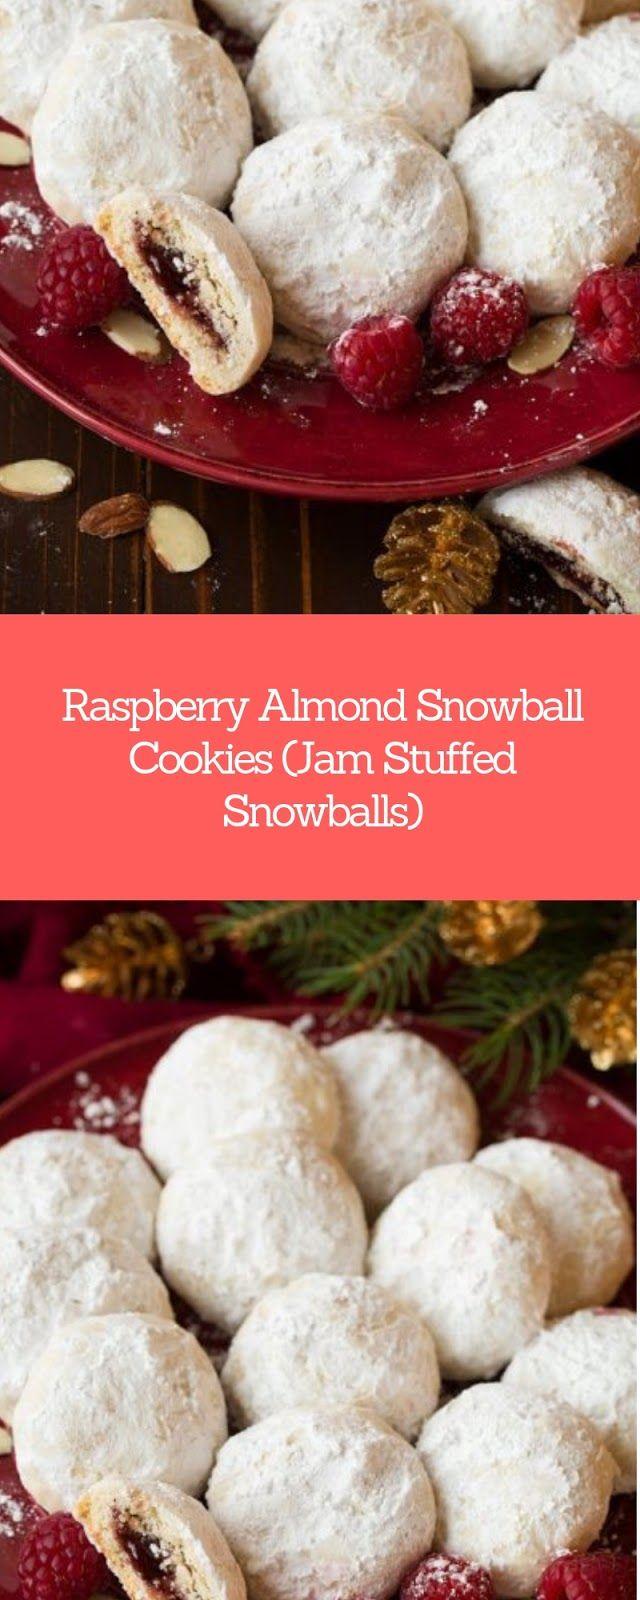 Raspberry Almond Snowball Cookies Jam Stuffed Snowballs Christmas